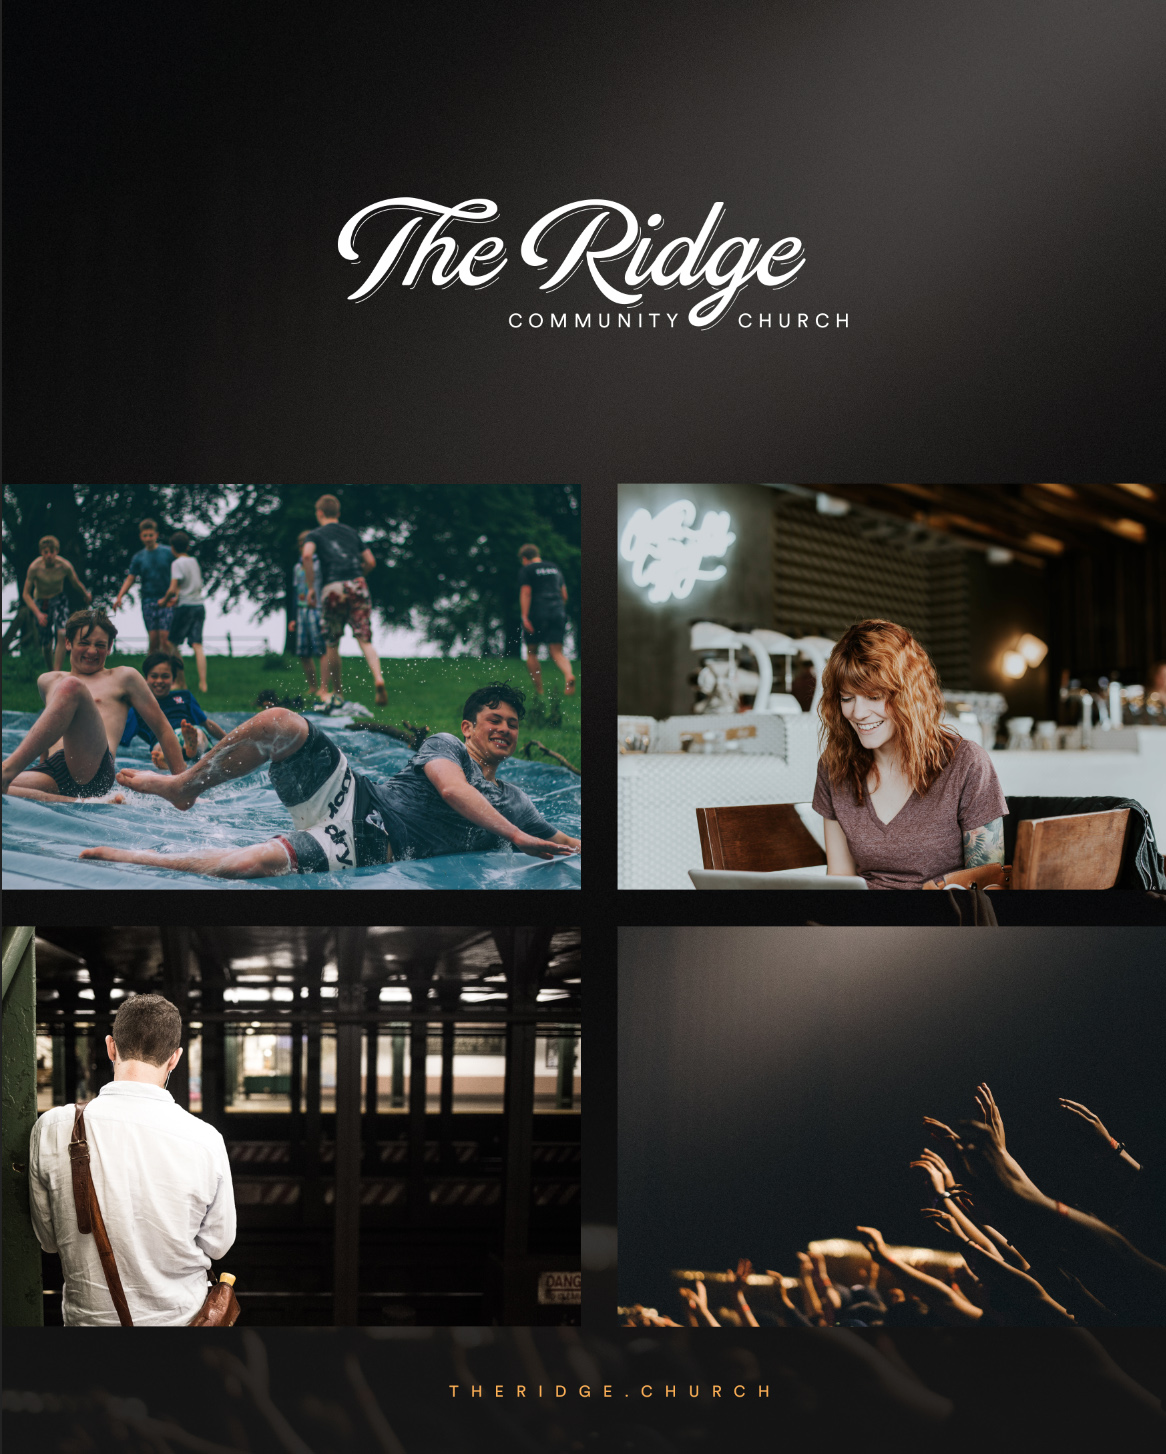 TheRidge-Concept-v2